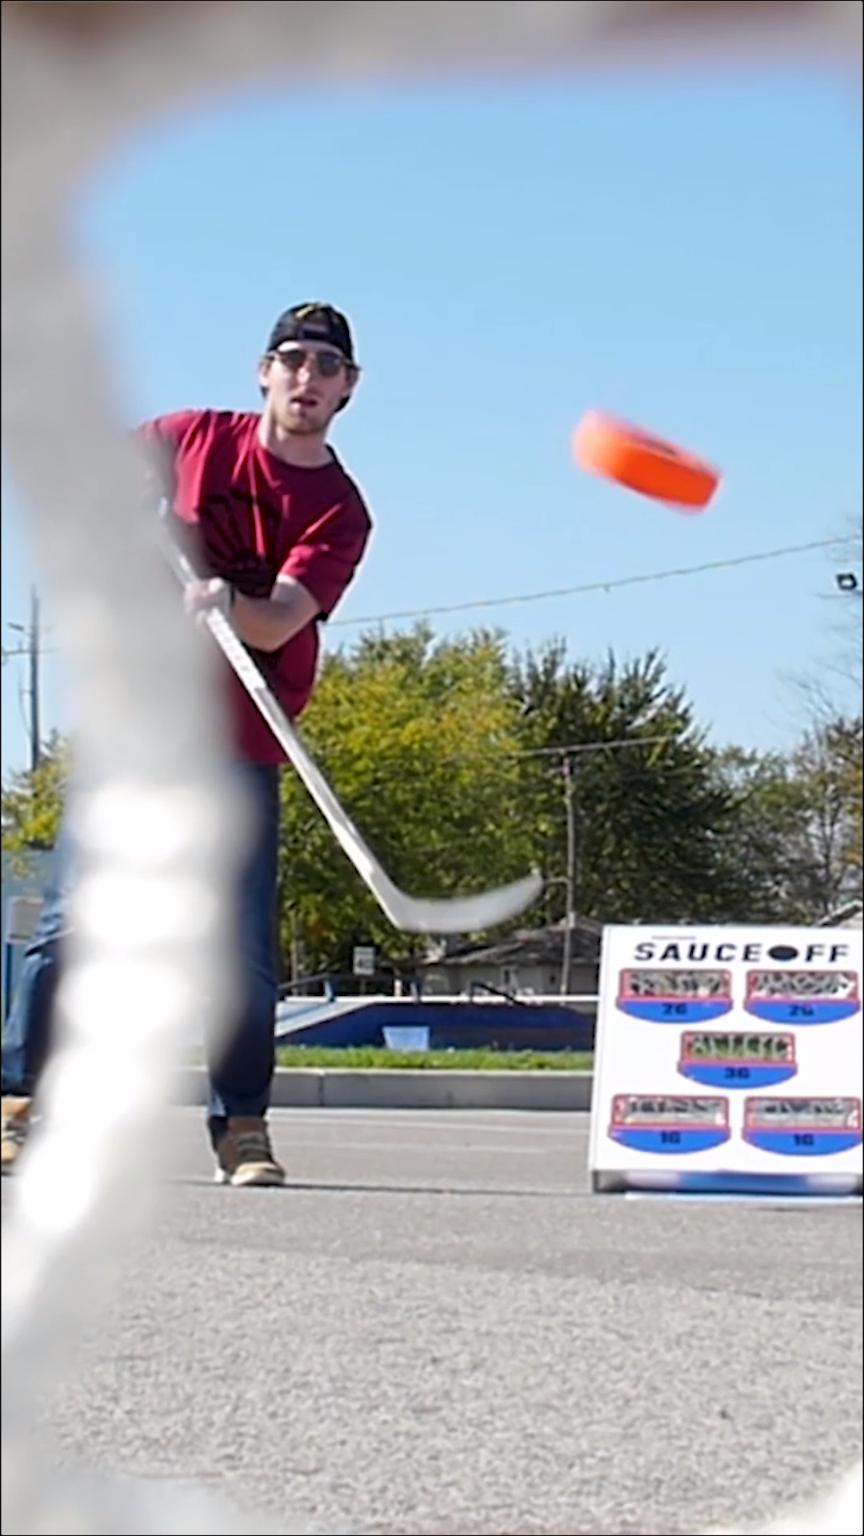 saucer king hockey game